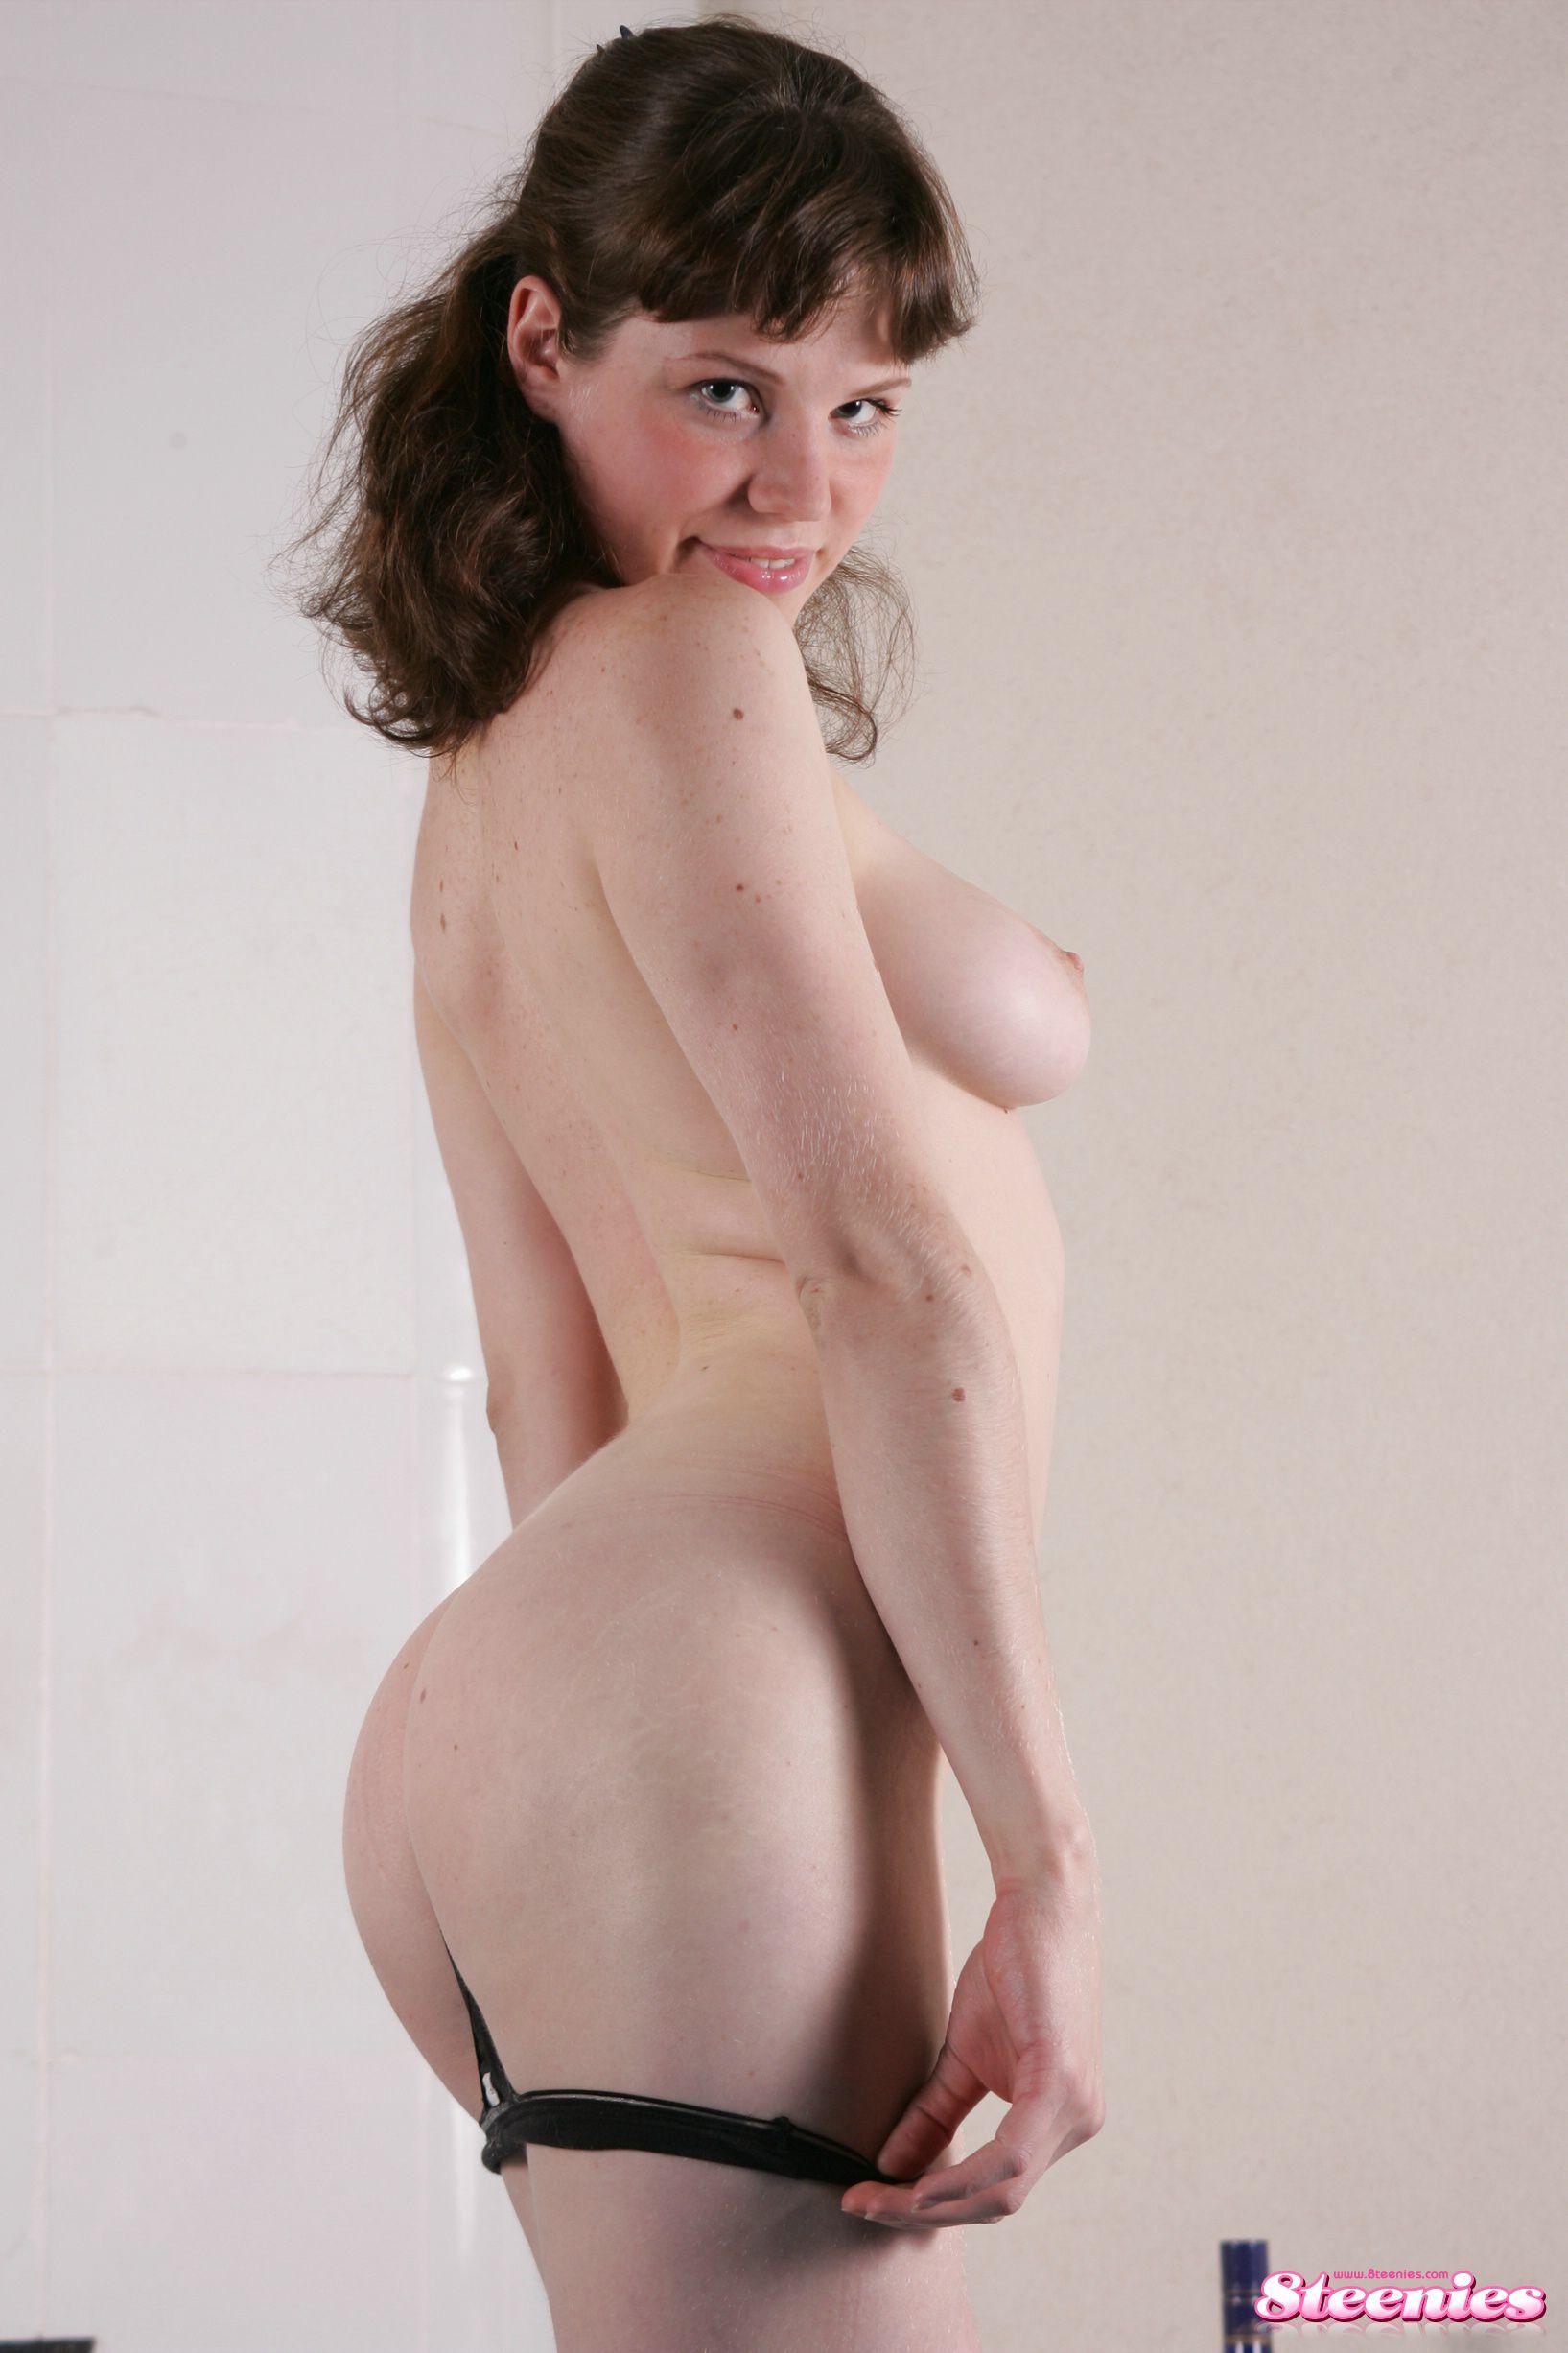 http://i5.imageban.ru/out/2013/11/26/52342f2cd0527e3adbdcb5c70d4d1357.jpg